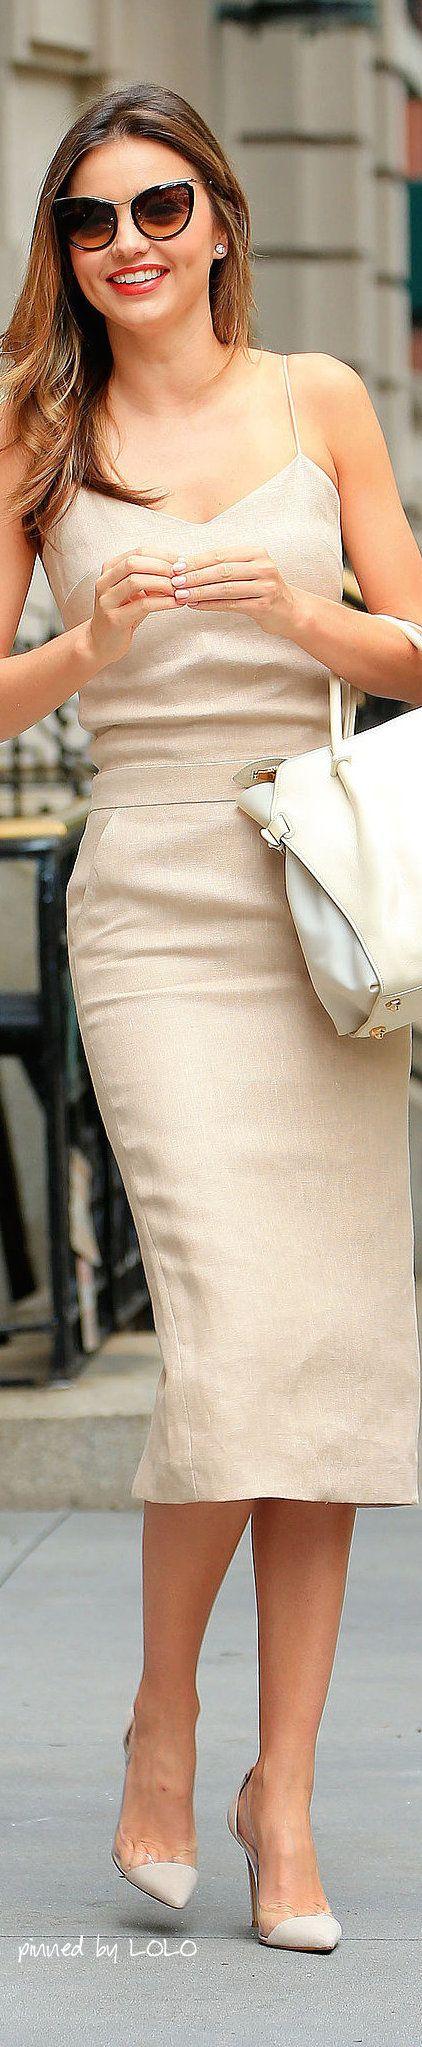 I like her style - Miranda Kerr